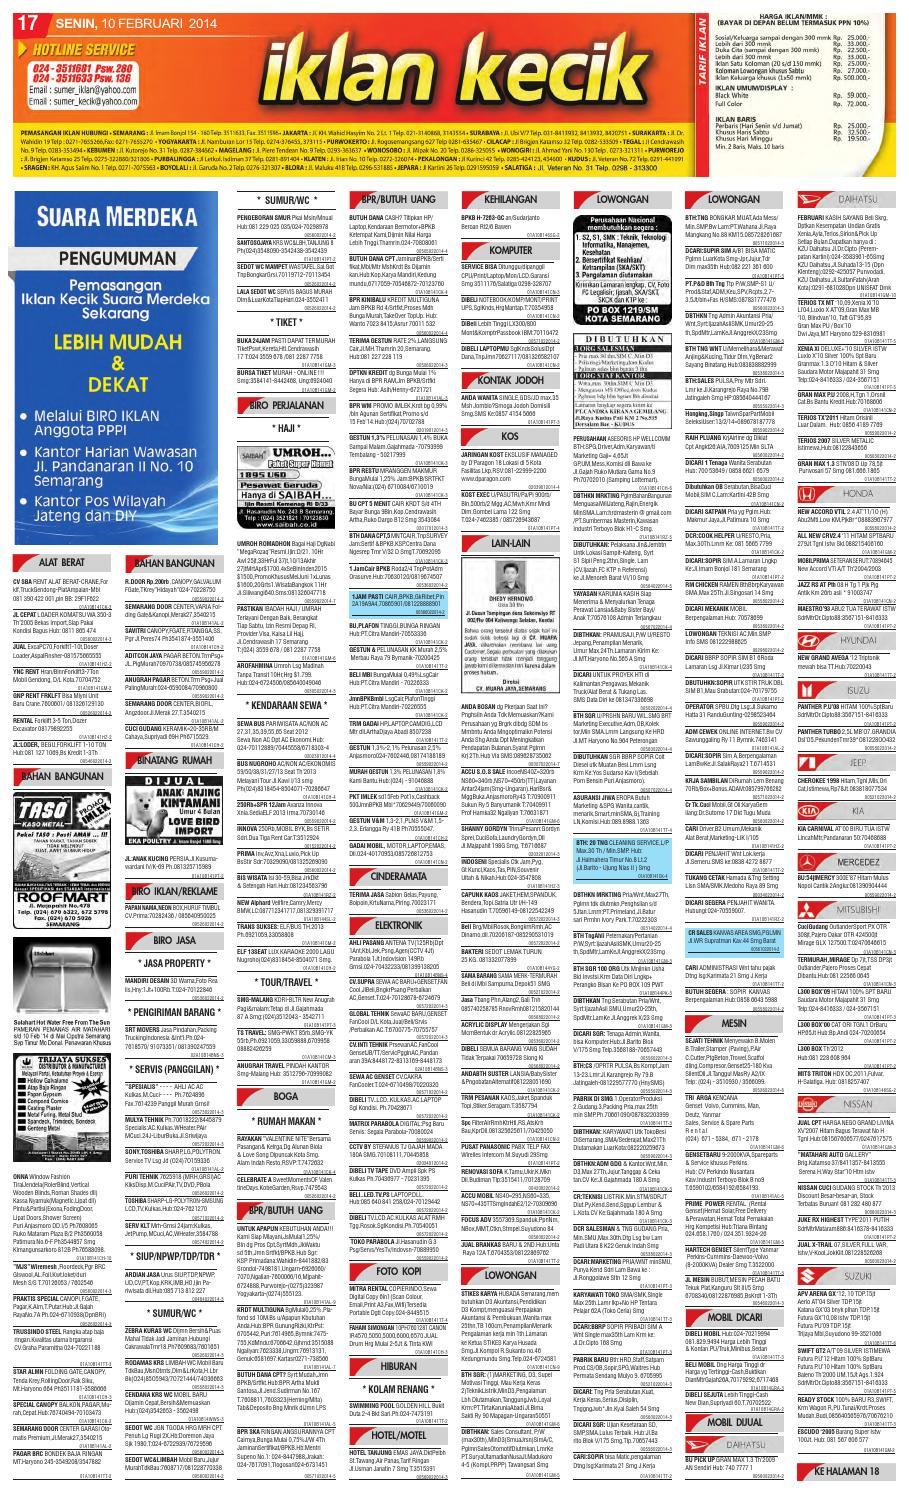 Iklan Kecik Suara Merdeka : iklan, kecik, suara, merdeka, Suara, Merdeka, 10-02-14, Adilia, Fibrianti, Issuu